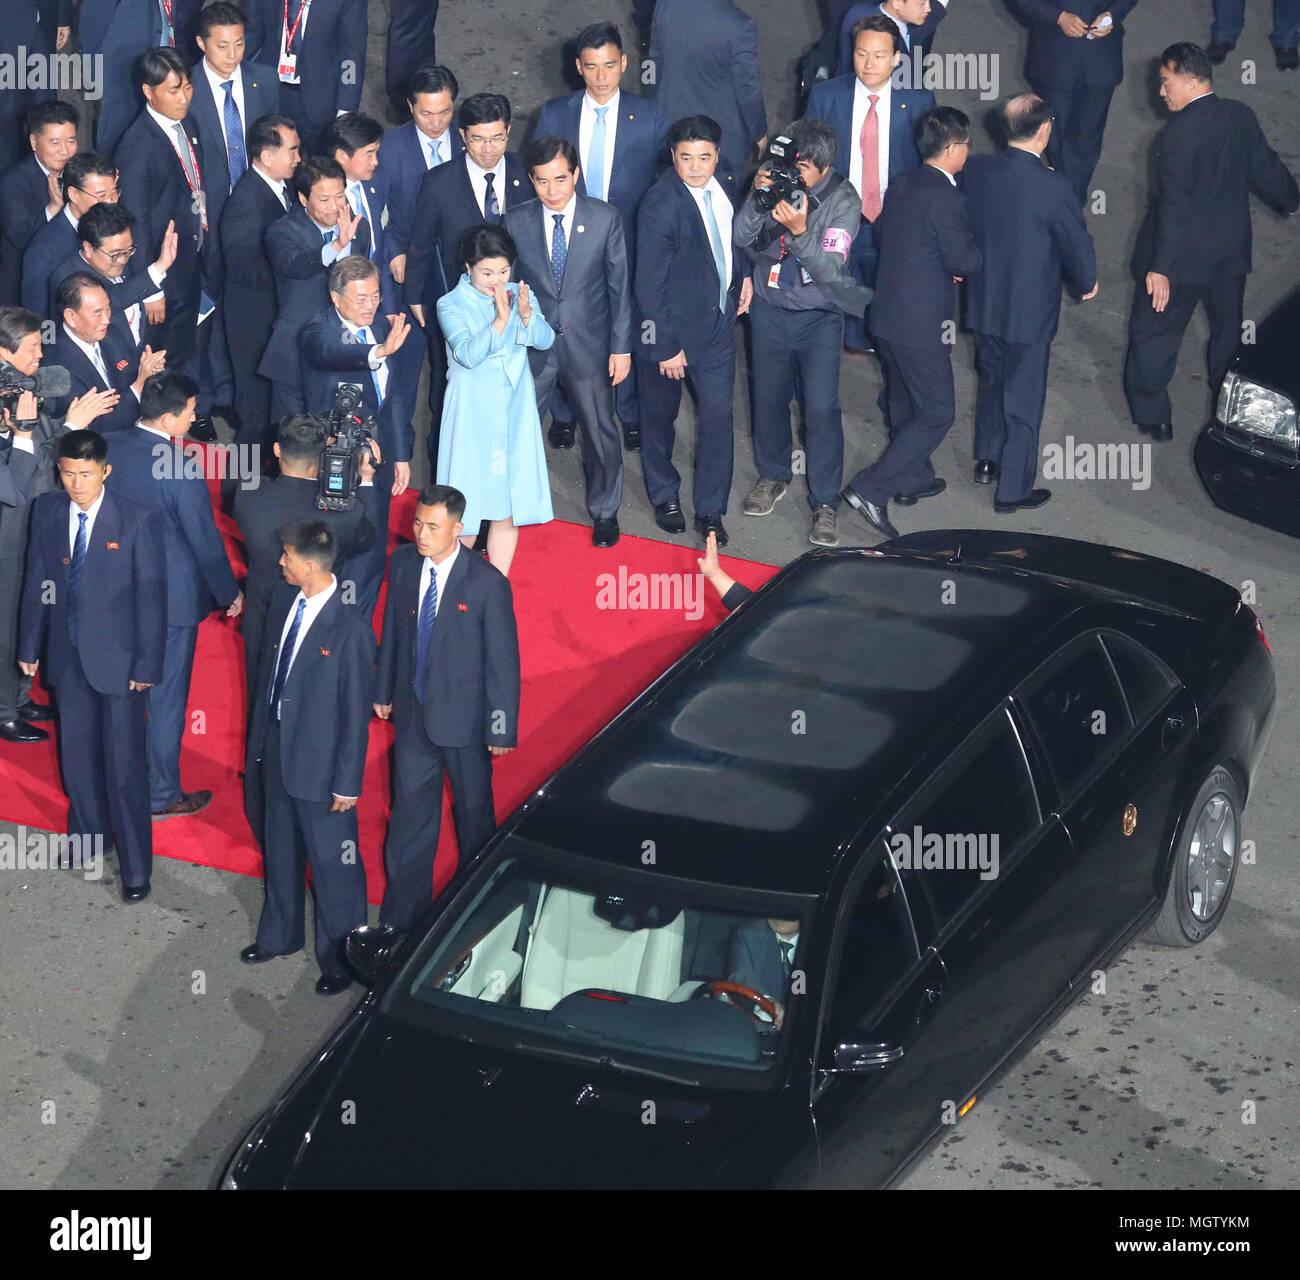 kim jong-un, apr 27, 2018 : north korean leader kim jong-un in a car